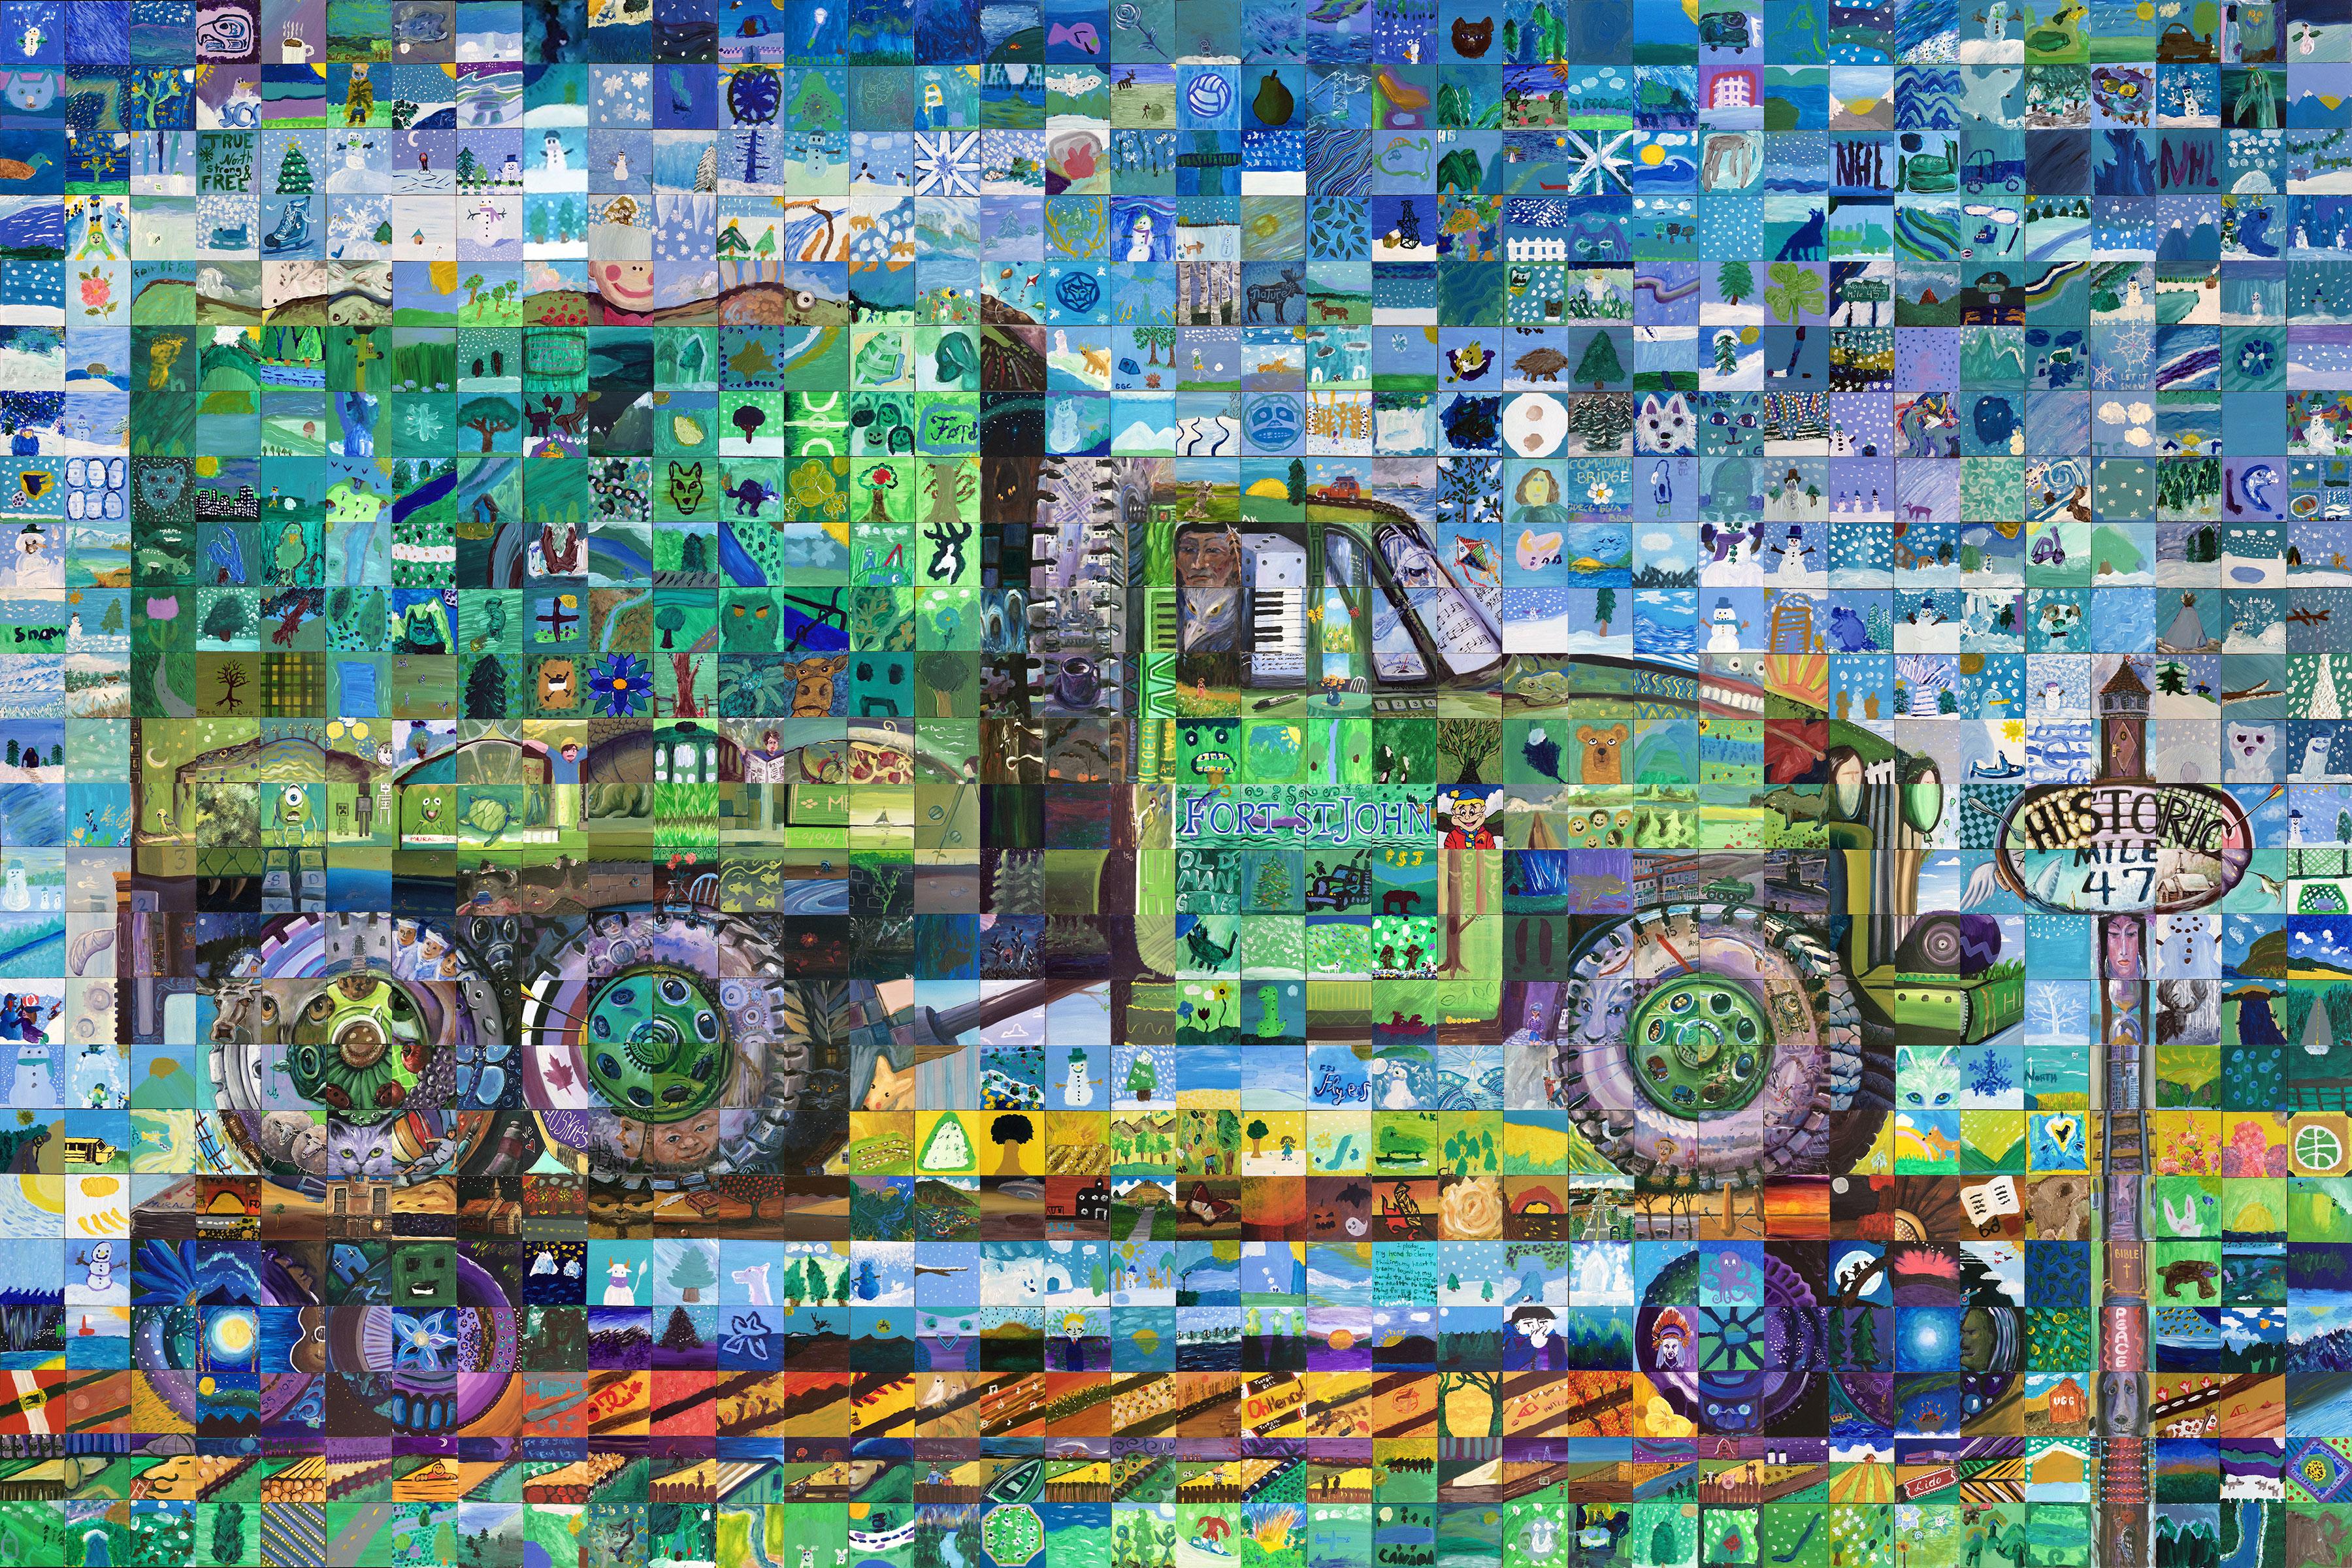 Fort st john canada mosaic murals for Cochrane mural mosaic